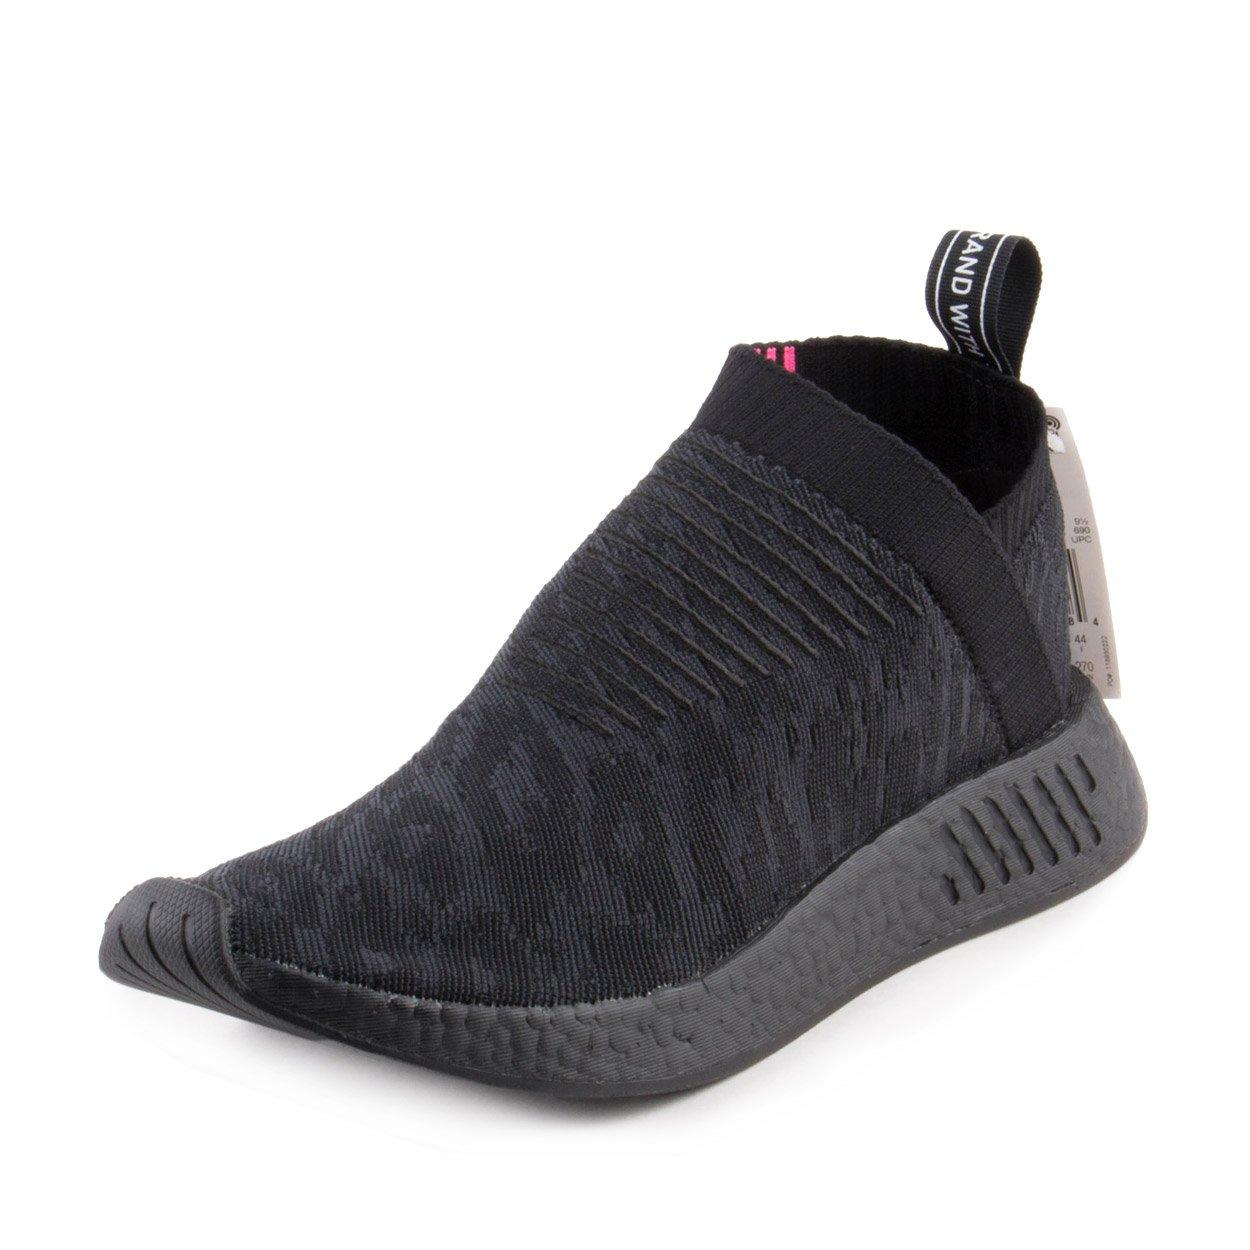 d5ab8cf12d799 Galleon - Adidas NMD CS2 PK Core Black Core Black Core Black Shoes CQ2373  For Men (7.5)